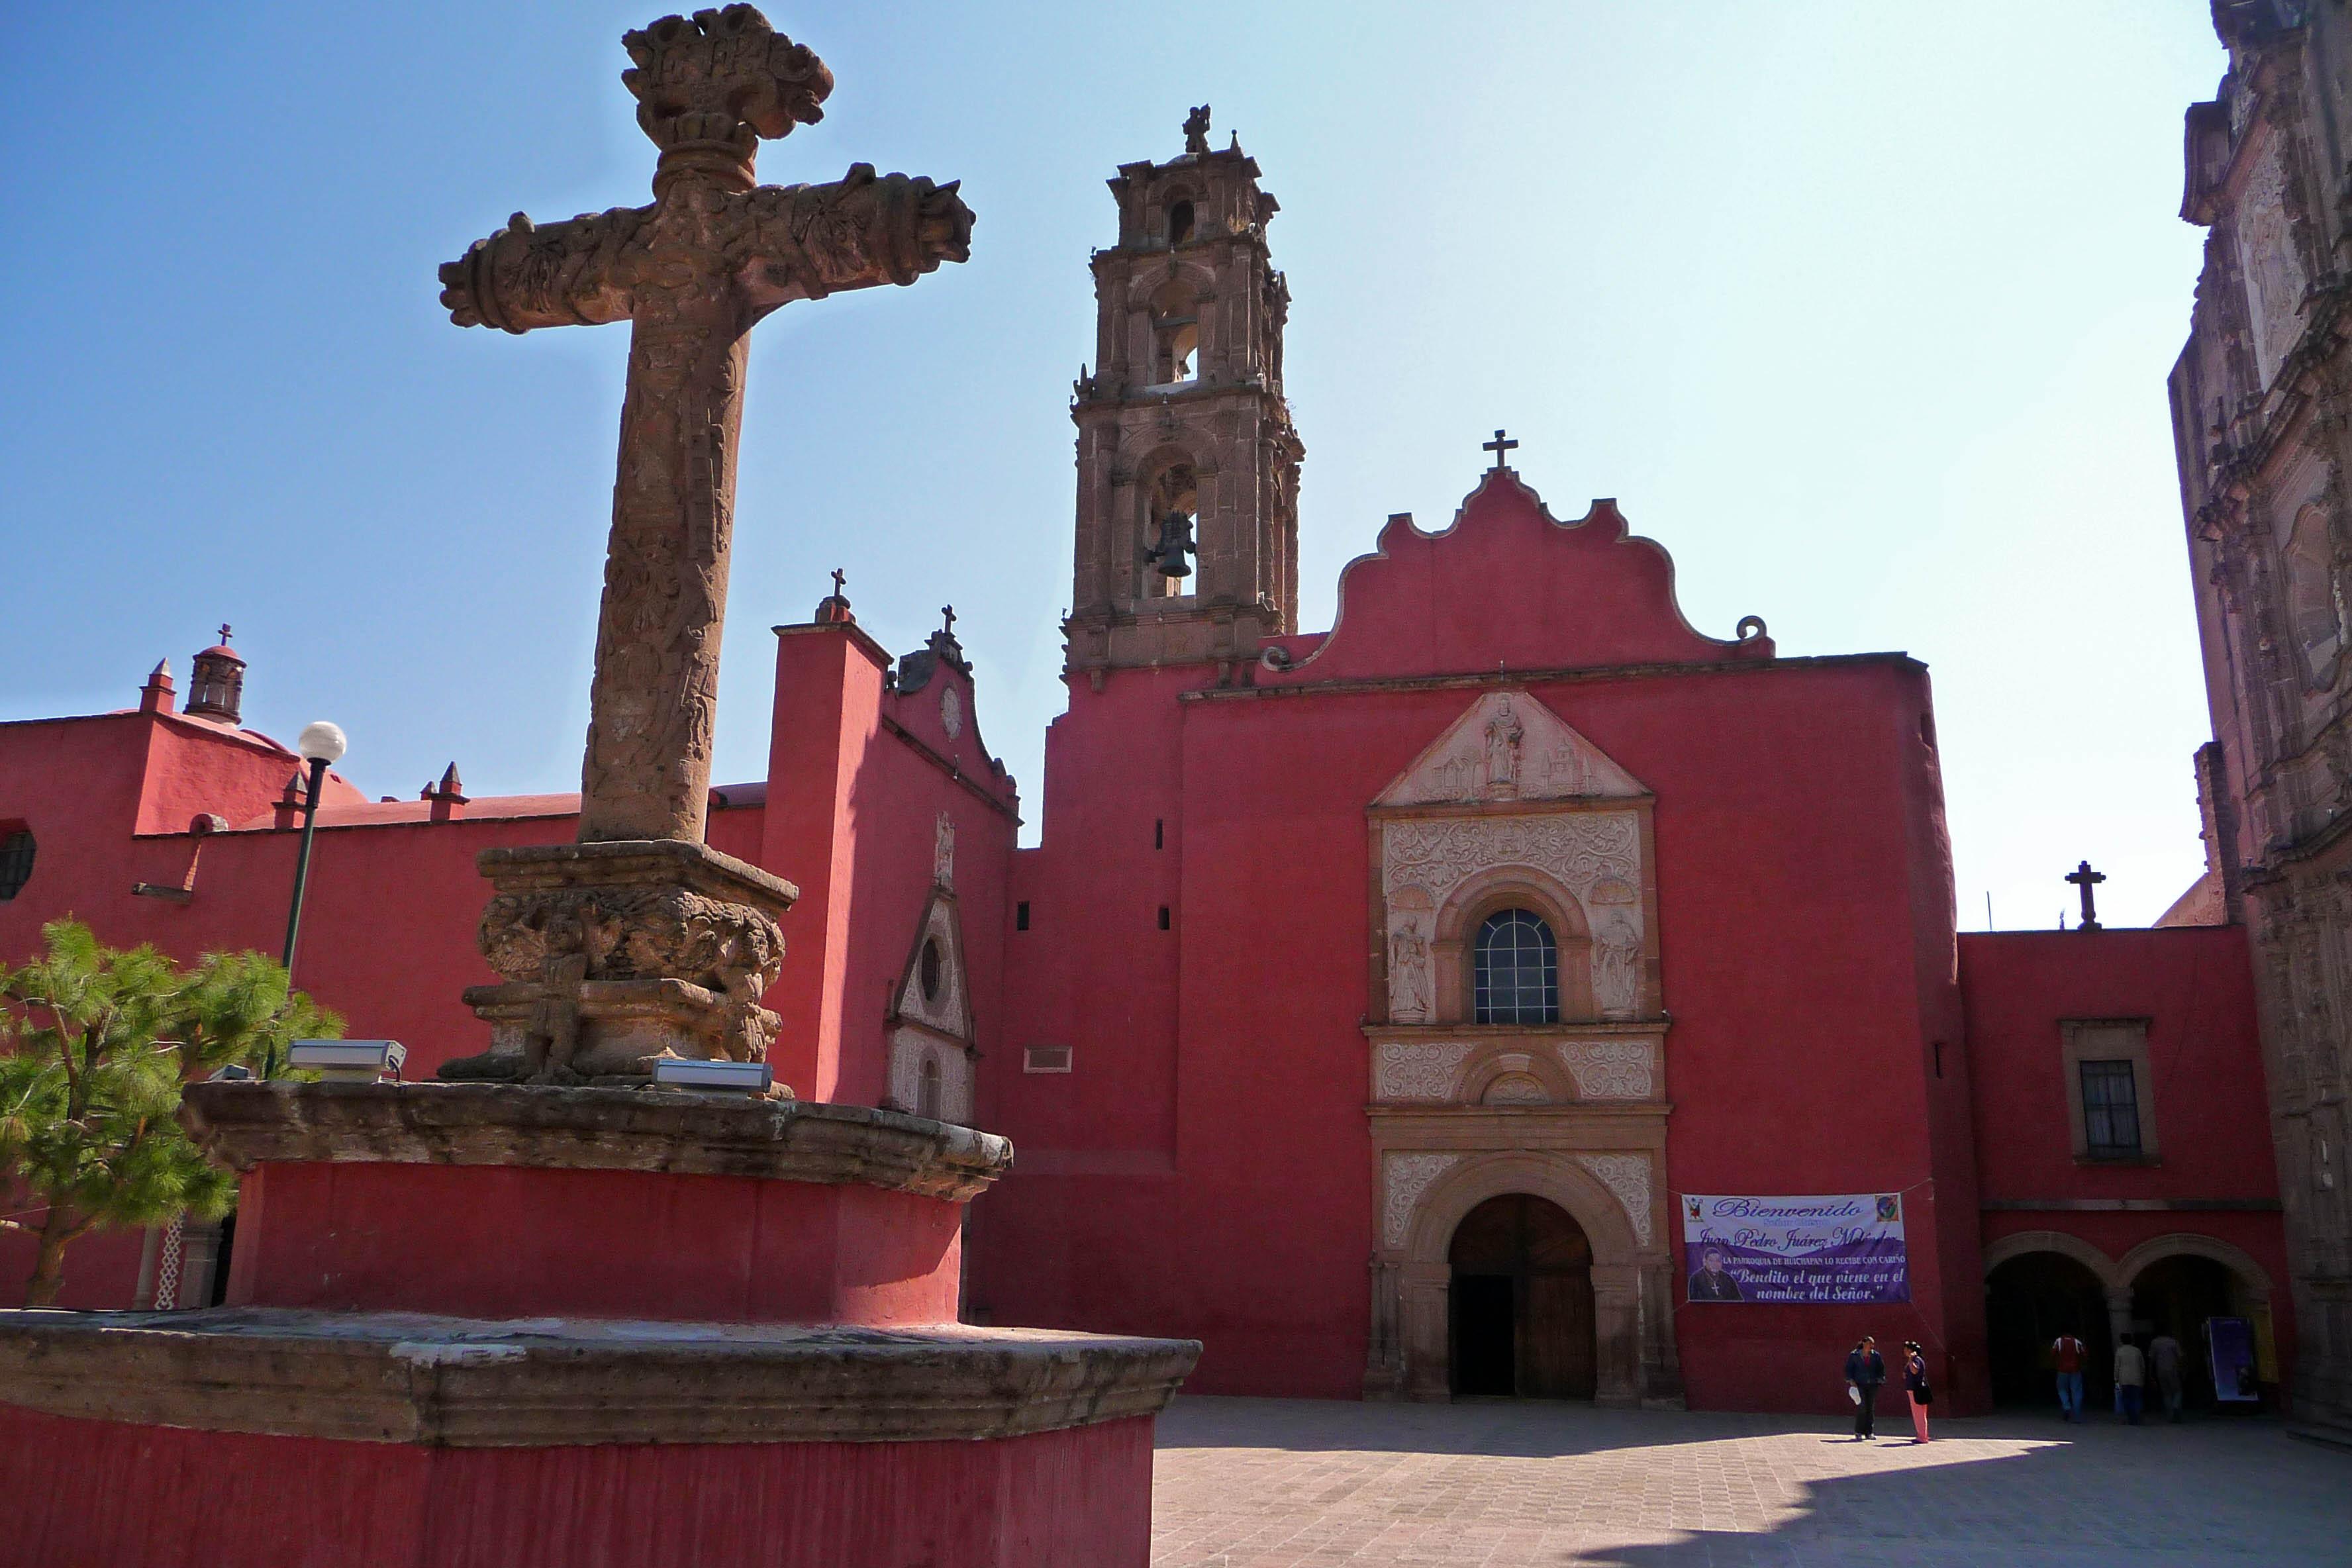 Parroquia de San Mateo Apóstol, Huichapan